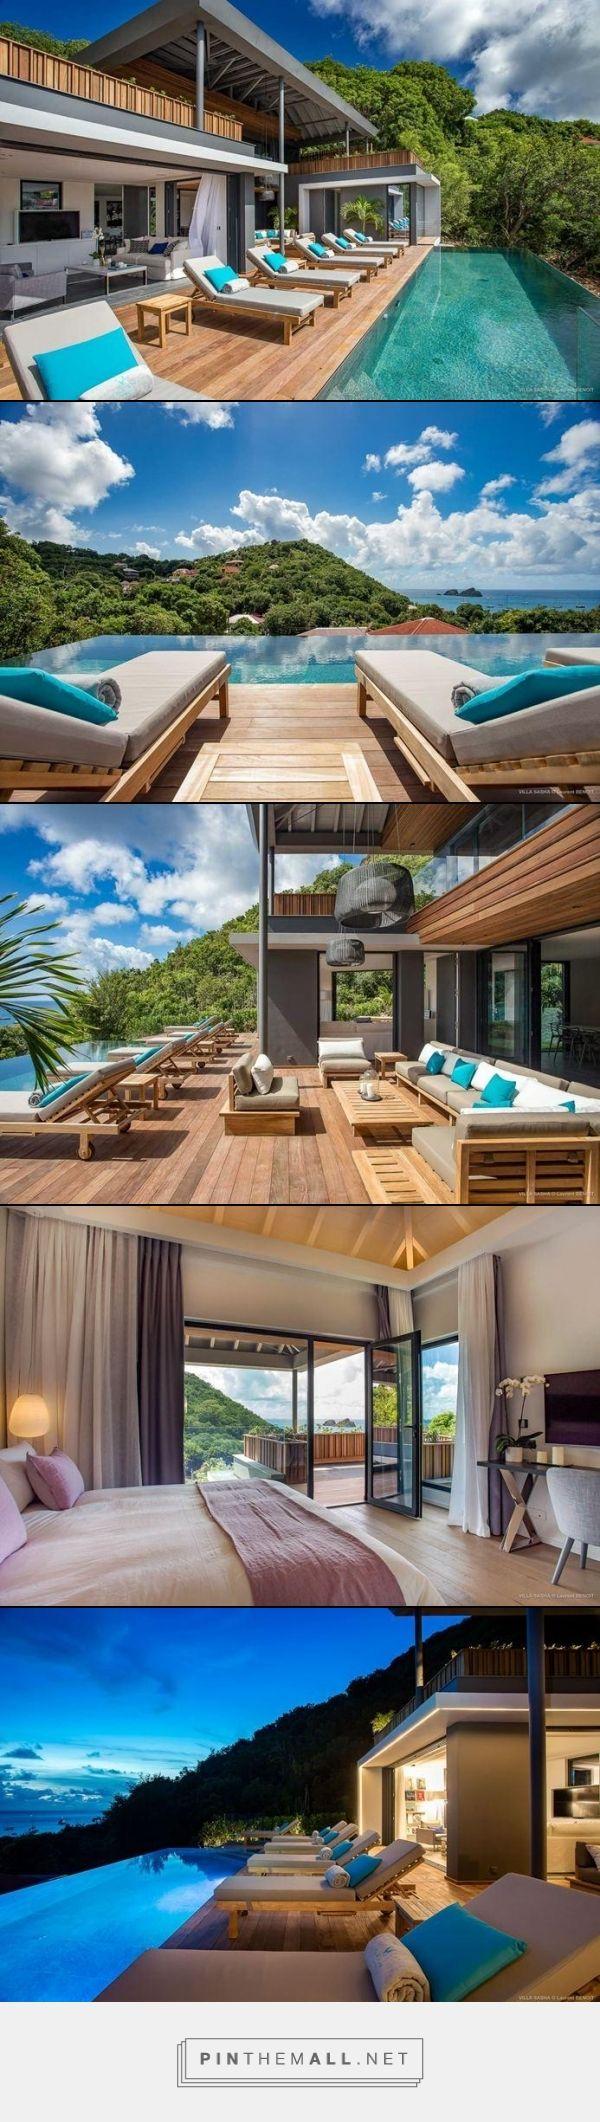 Best  Caribbean Homes Ideas On Pinterest - Caribbean homes designs